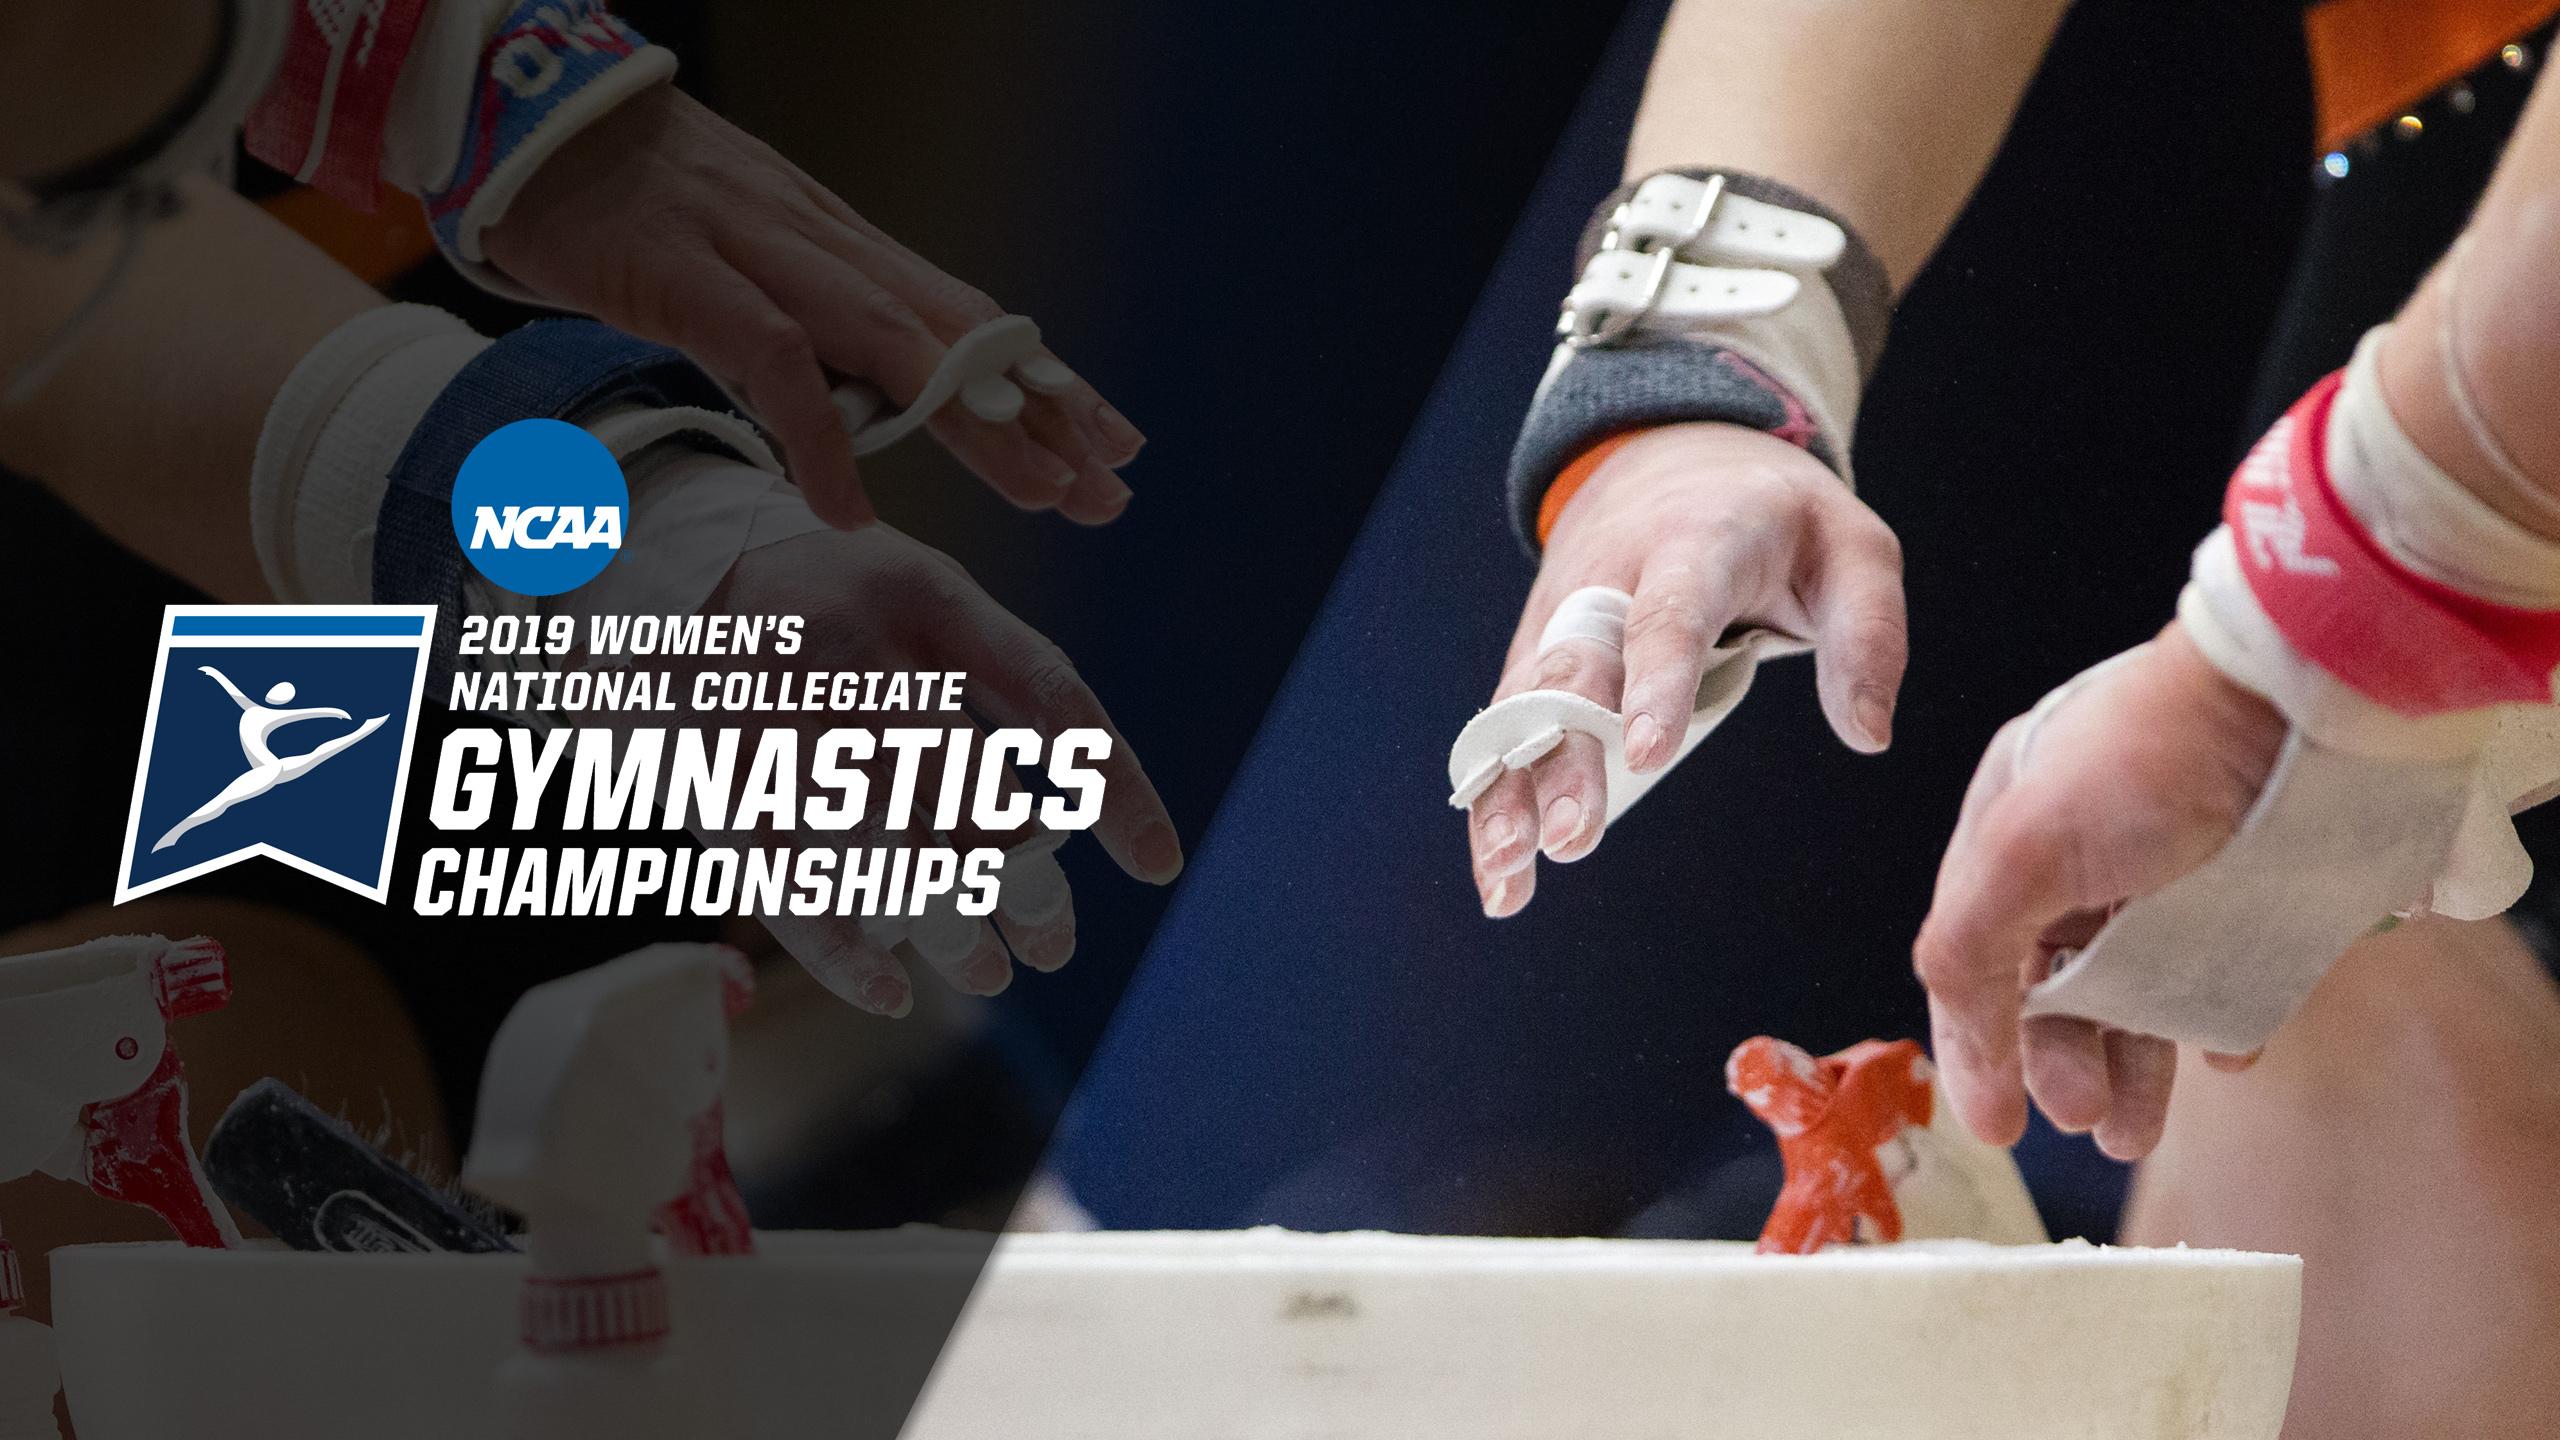 NCAA Women's Gymnastics Championships (All-Around Championship)